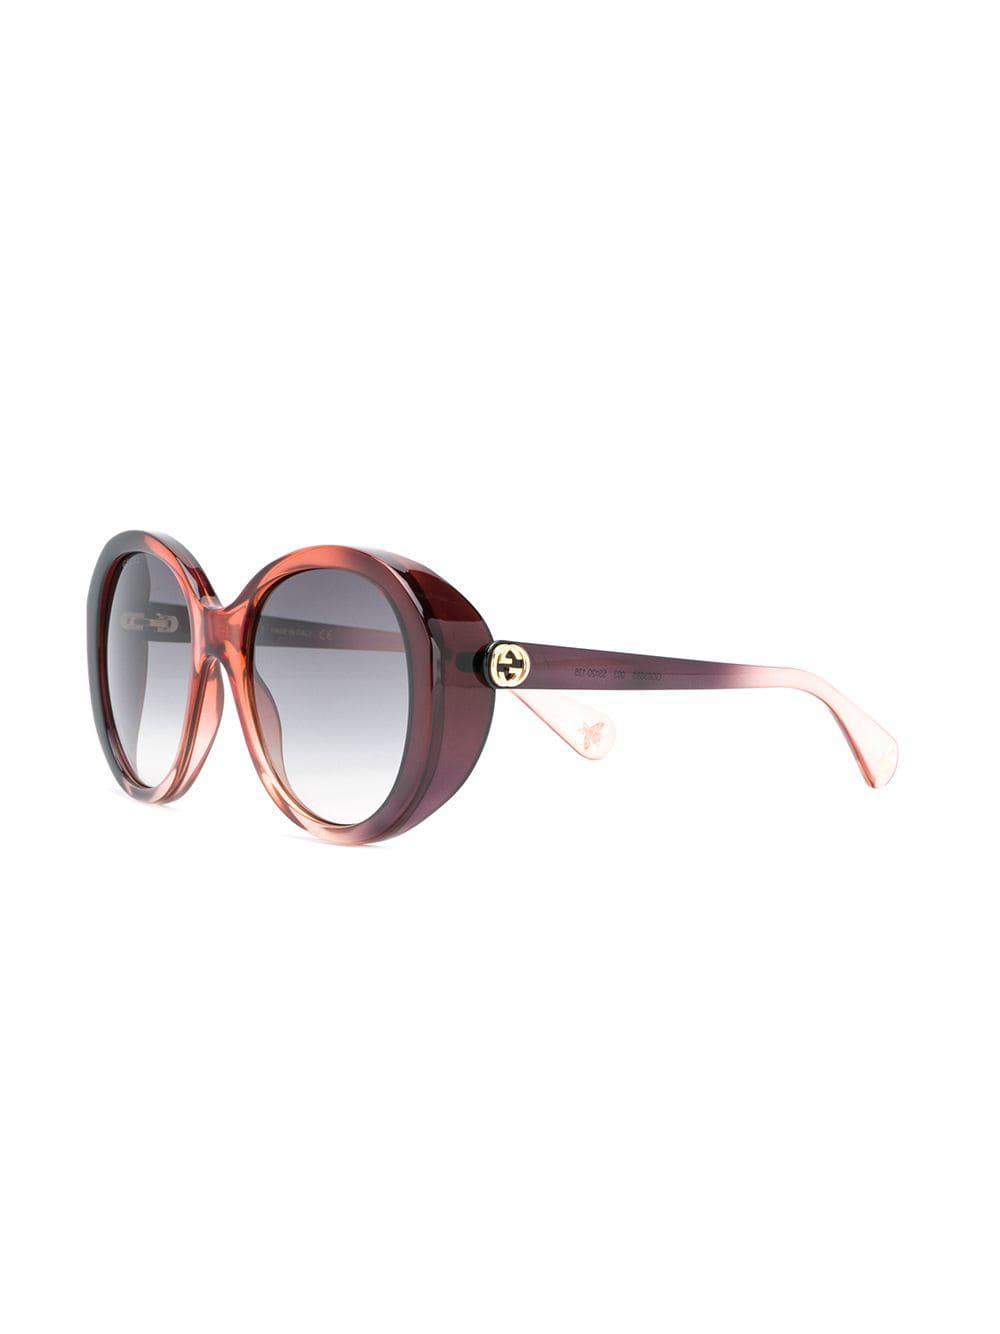 72c63a32237 Gucci - Brown Round Frame Sunglasses - Lyst. View fullscreen